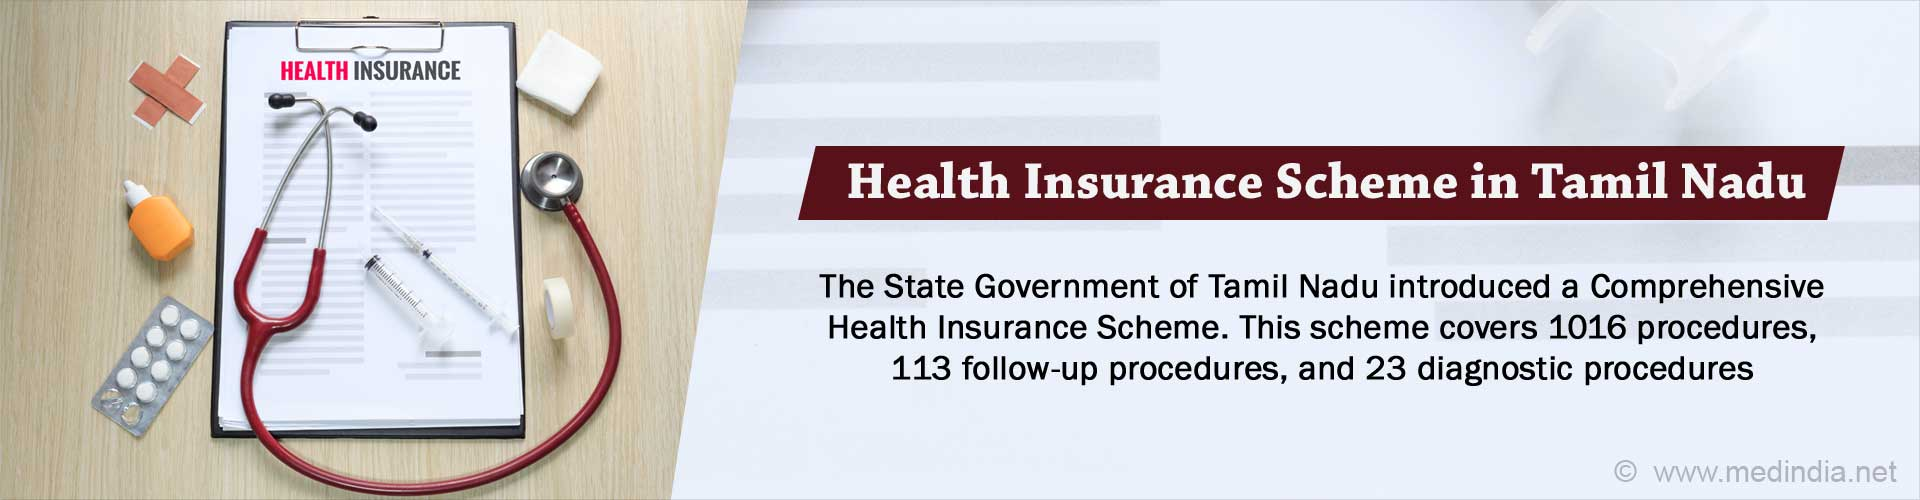 Comprehensive Health Insurance Scheme in Tamil Nadu - Eligibility, Procedure, Features, Benefits